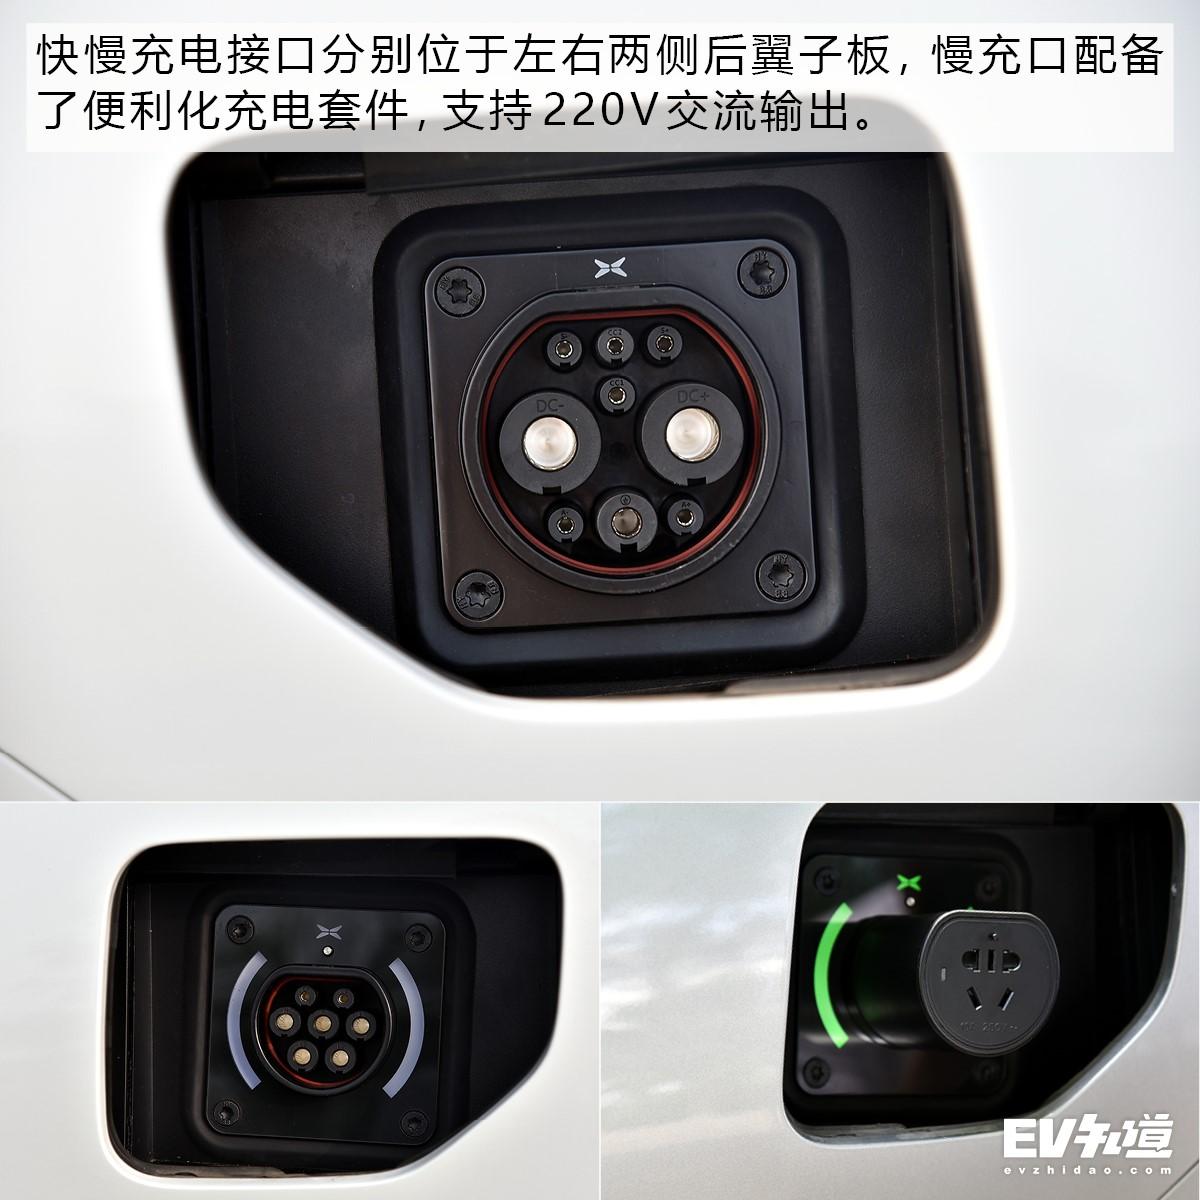 E-TEST 8:小鹏P7四驱高性能电耗测试+静、动态体验